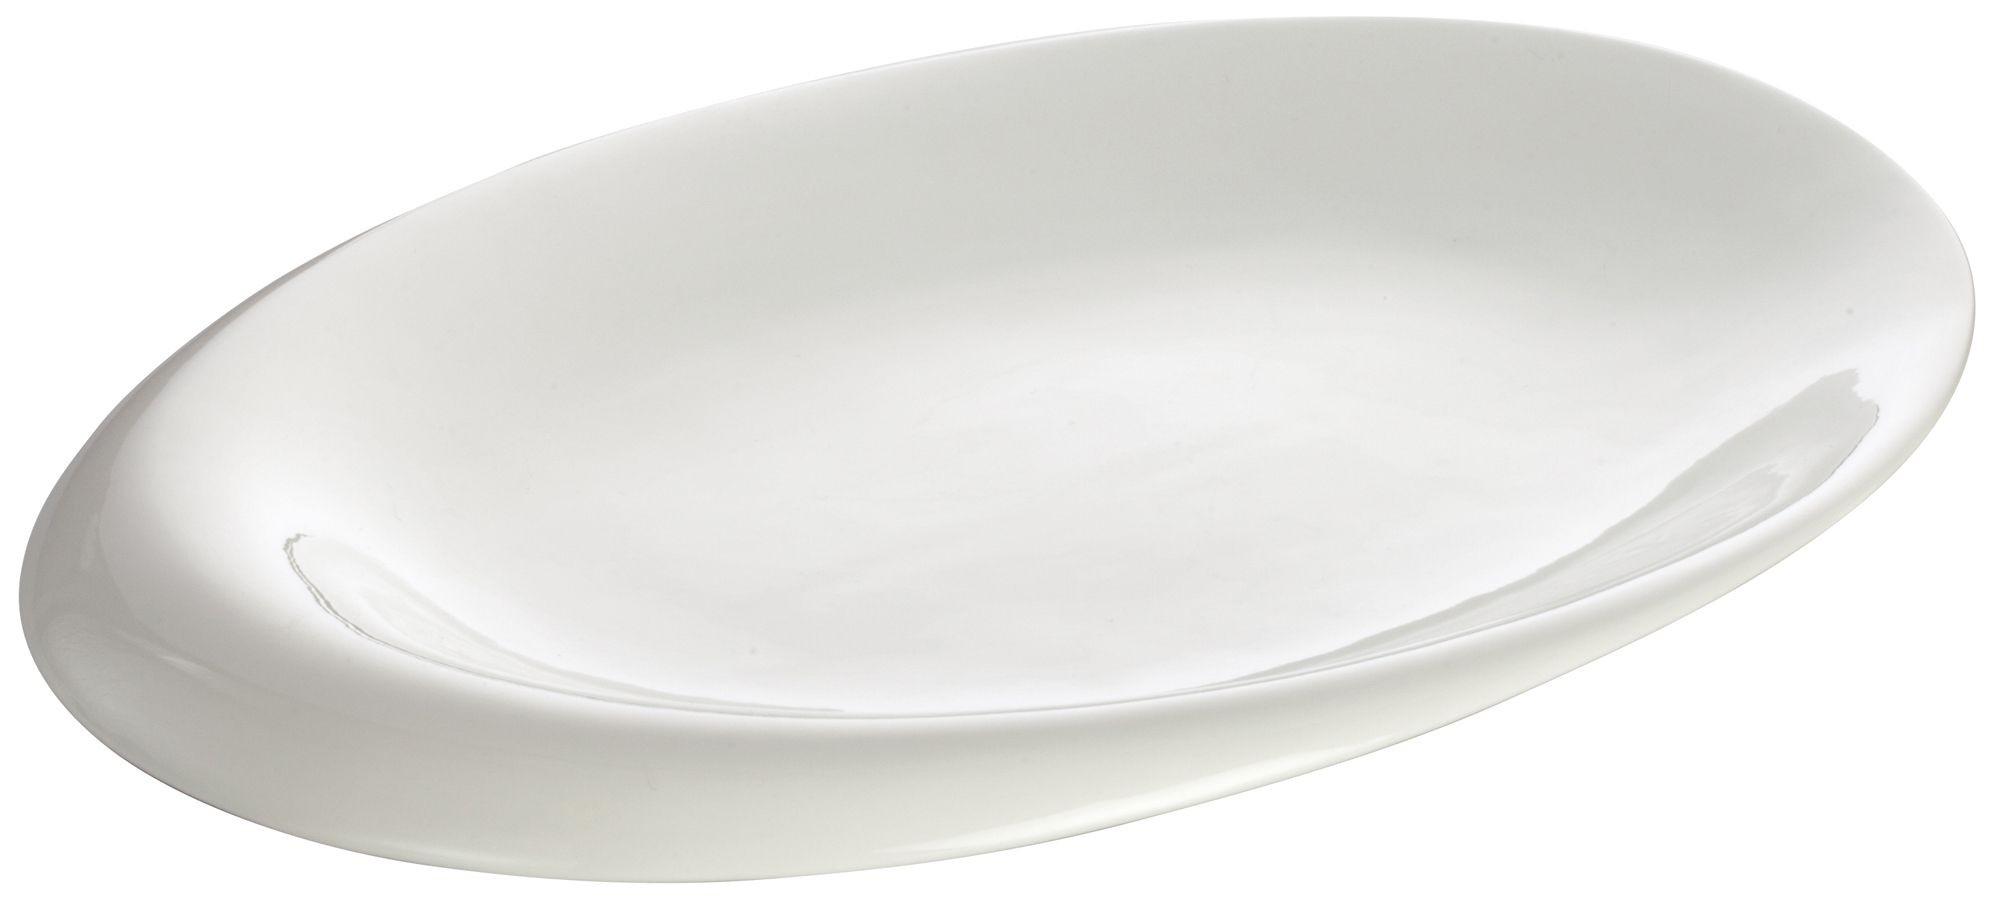 "Winco WDP004-209 Ocea Creamy White Porcelain Oval Bowl 10"" x 7-7/8"""